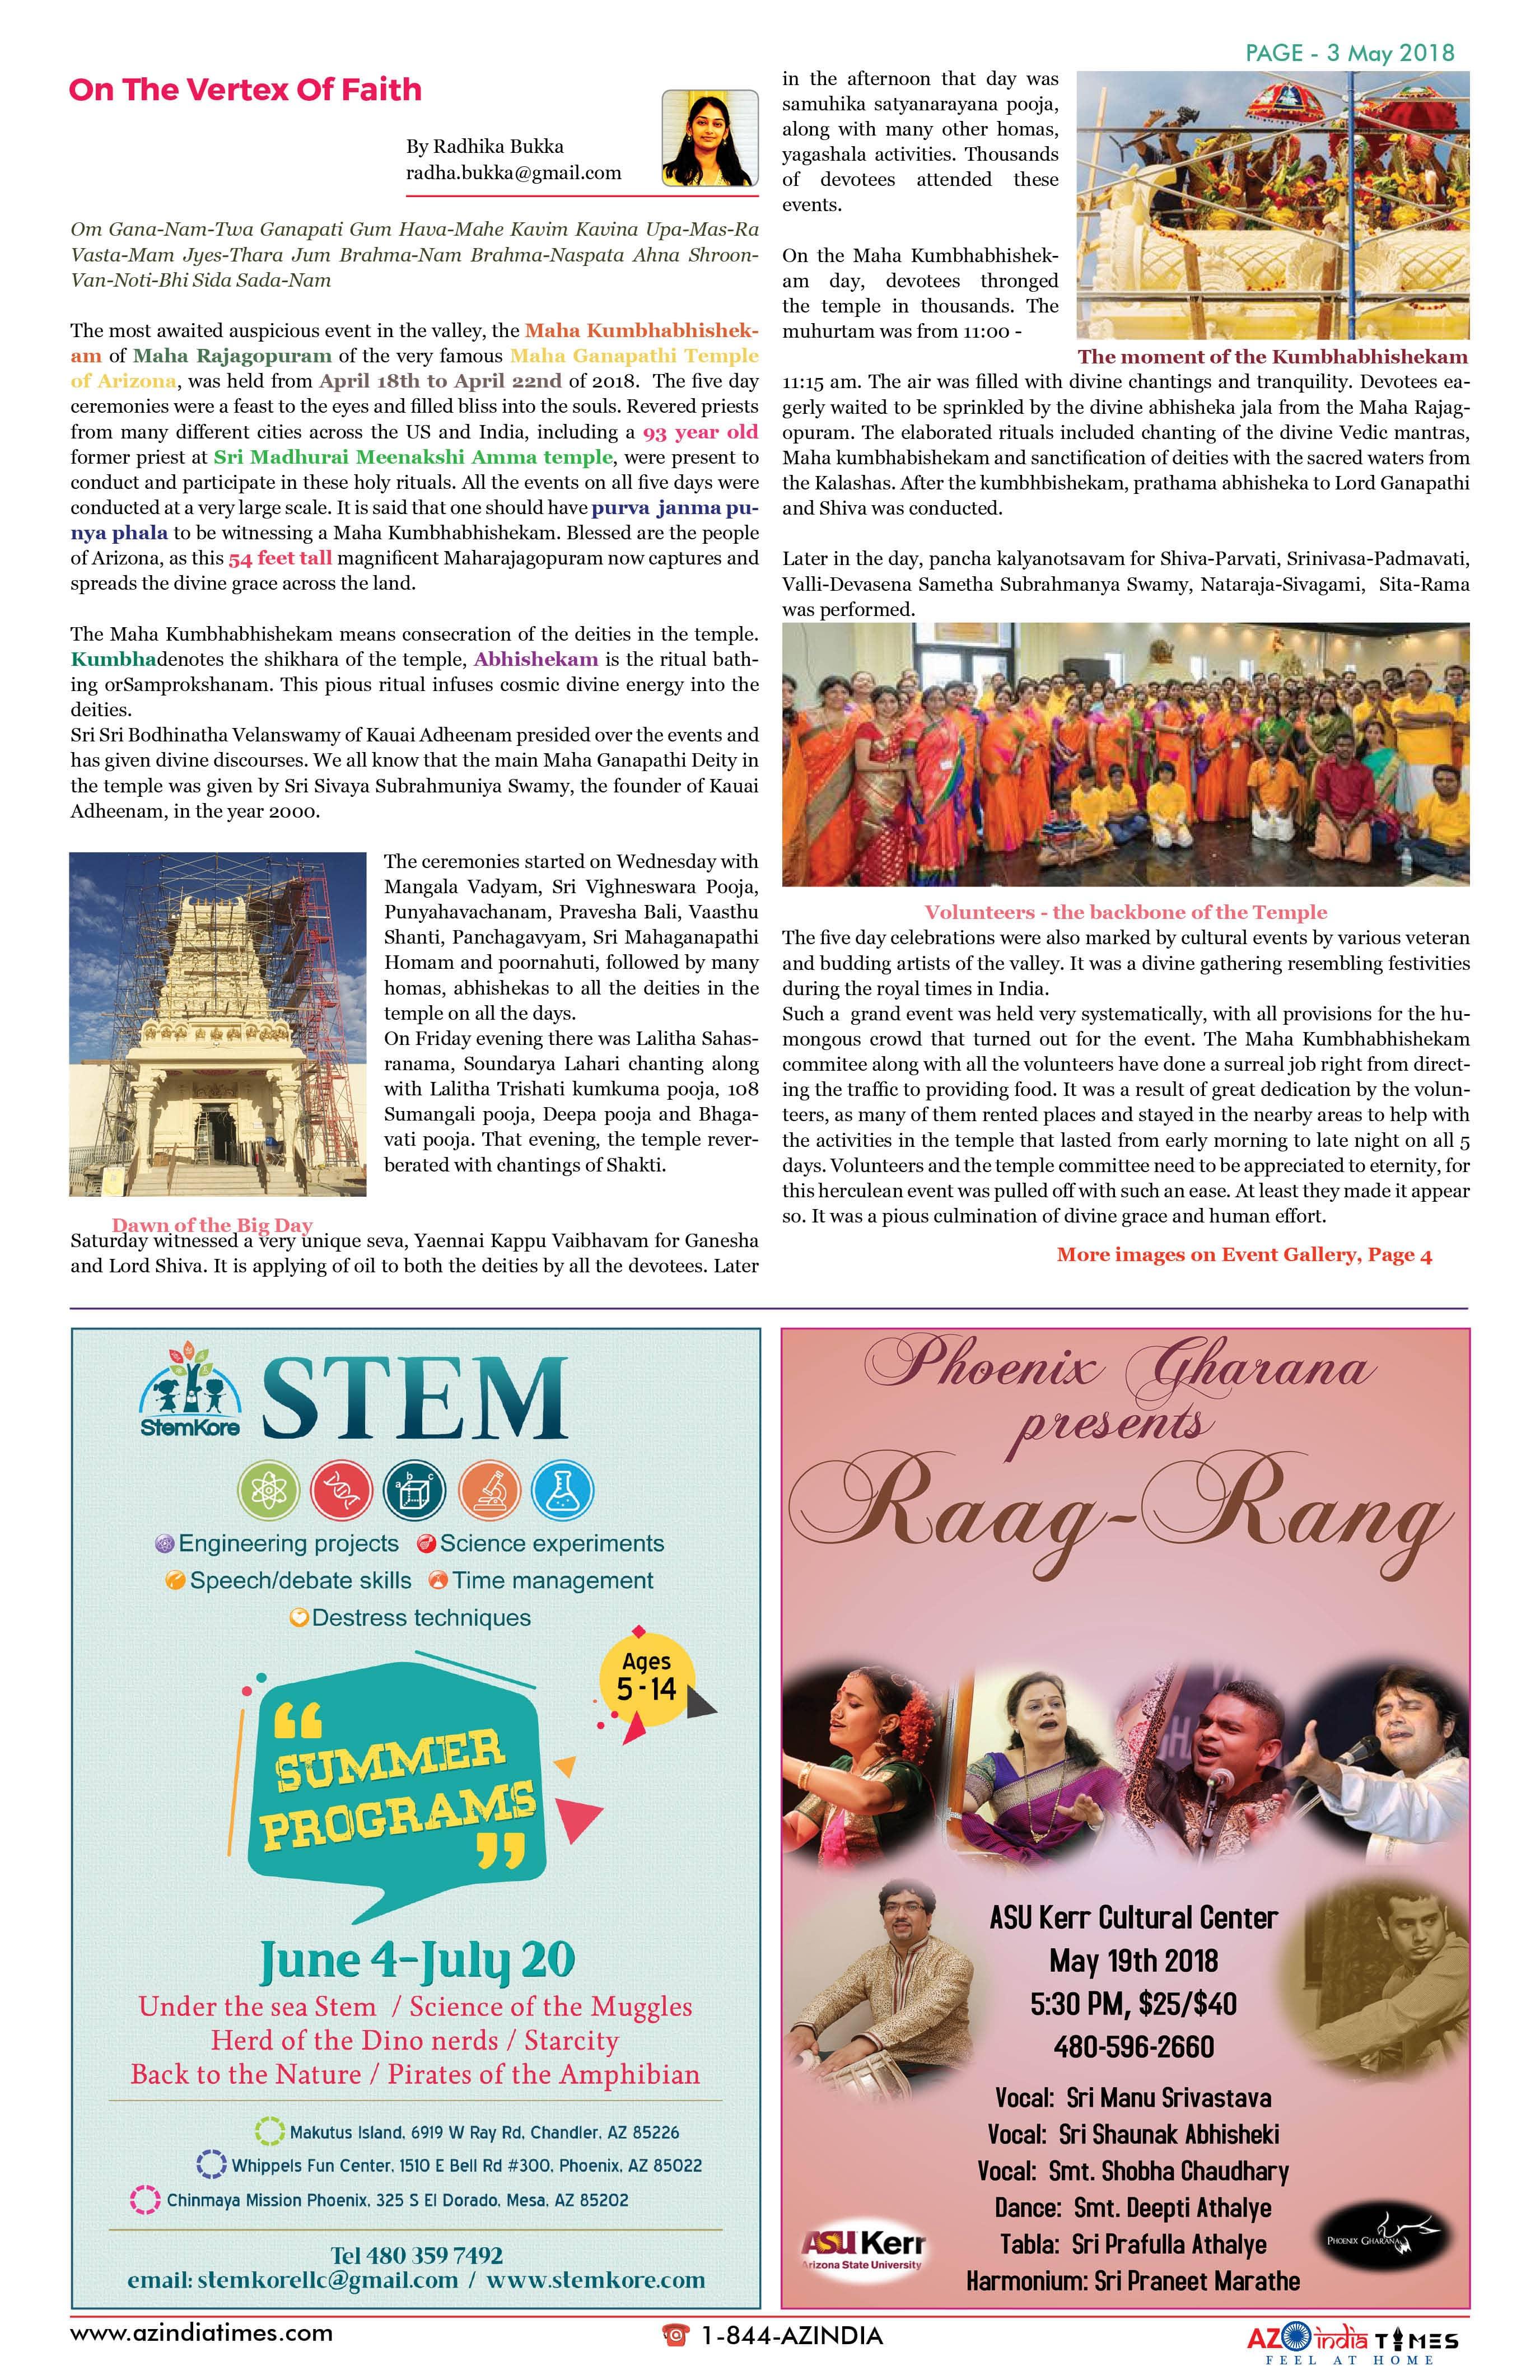 AZ INDIA MAY EDITION 3